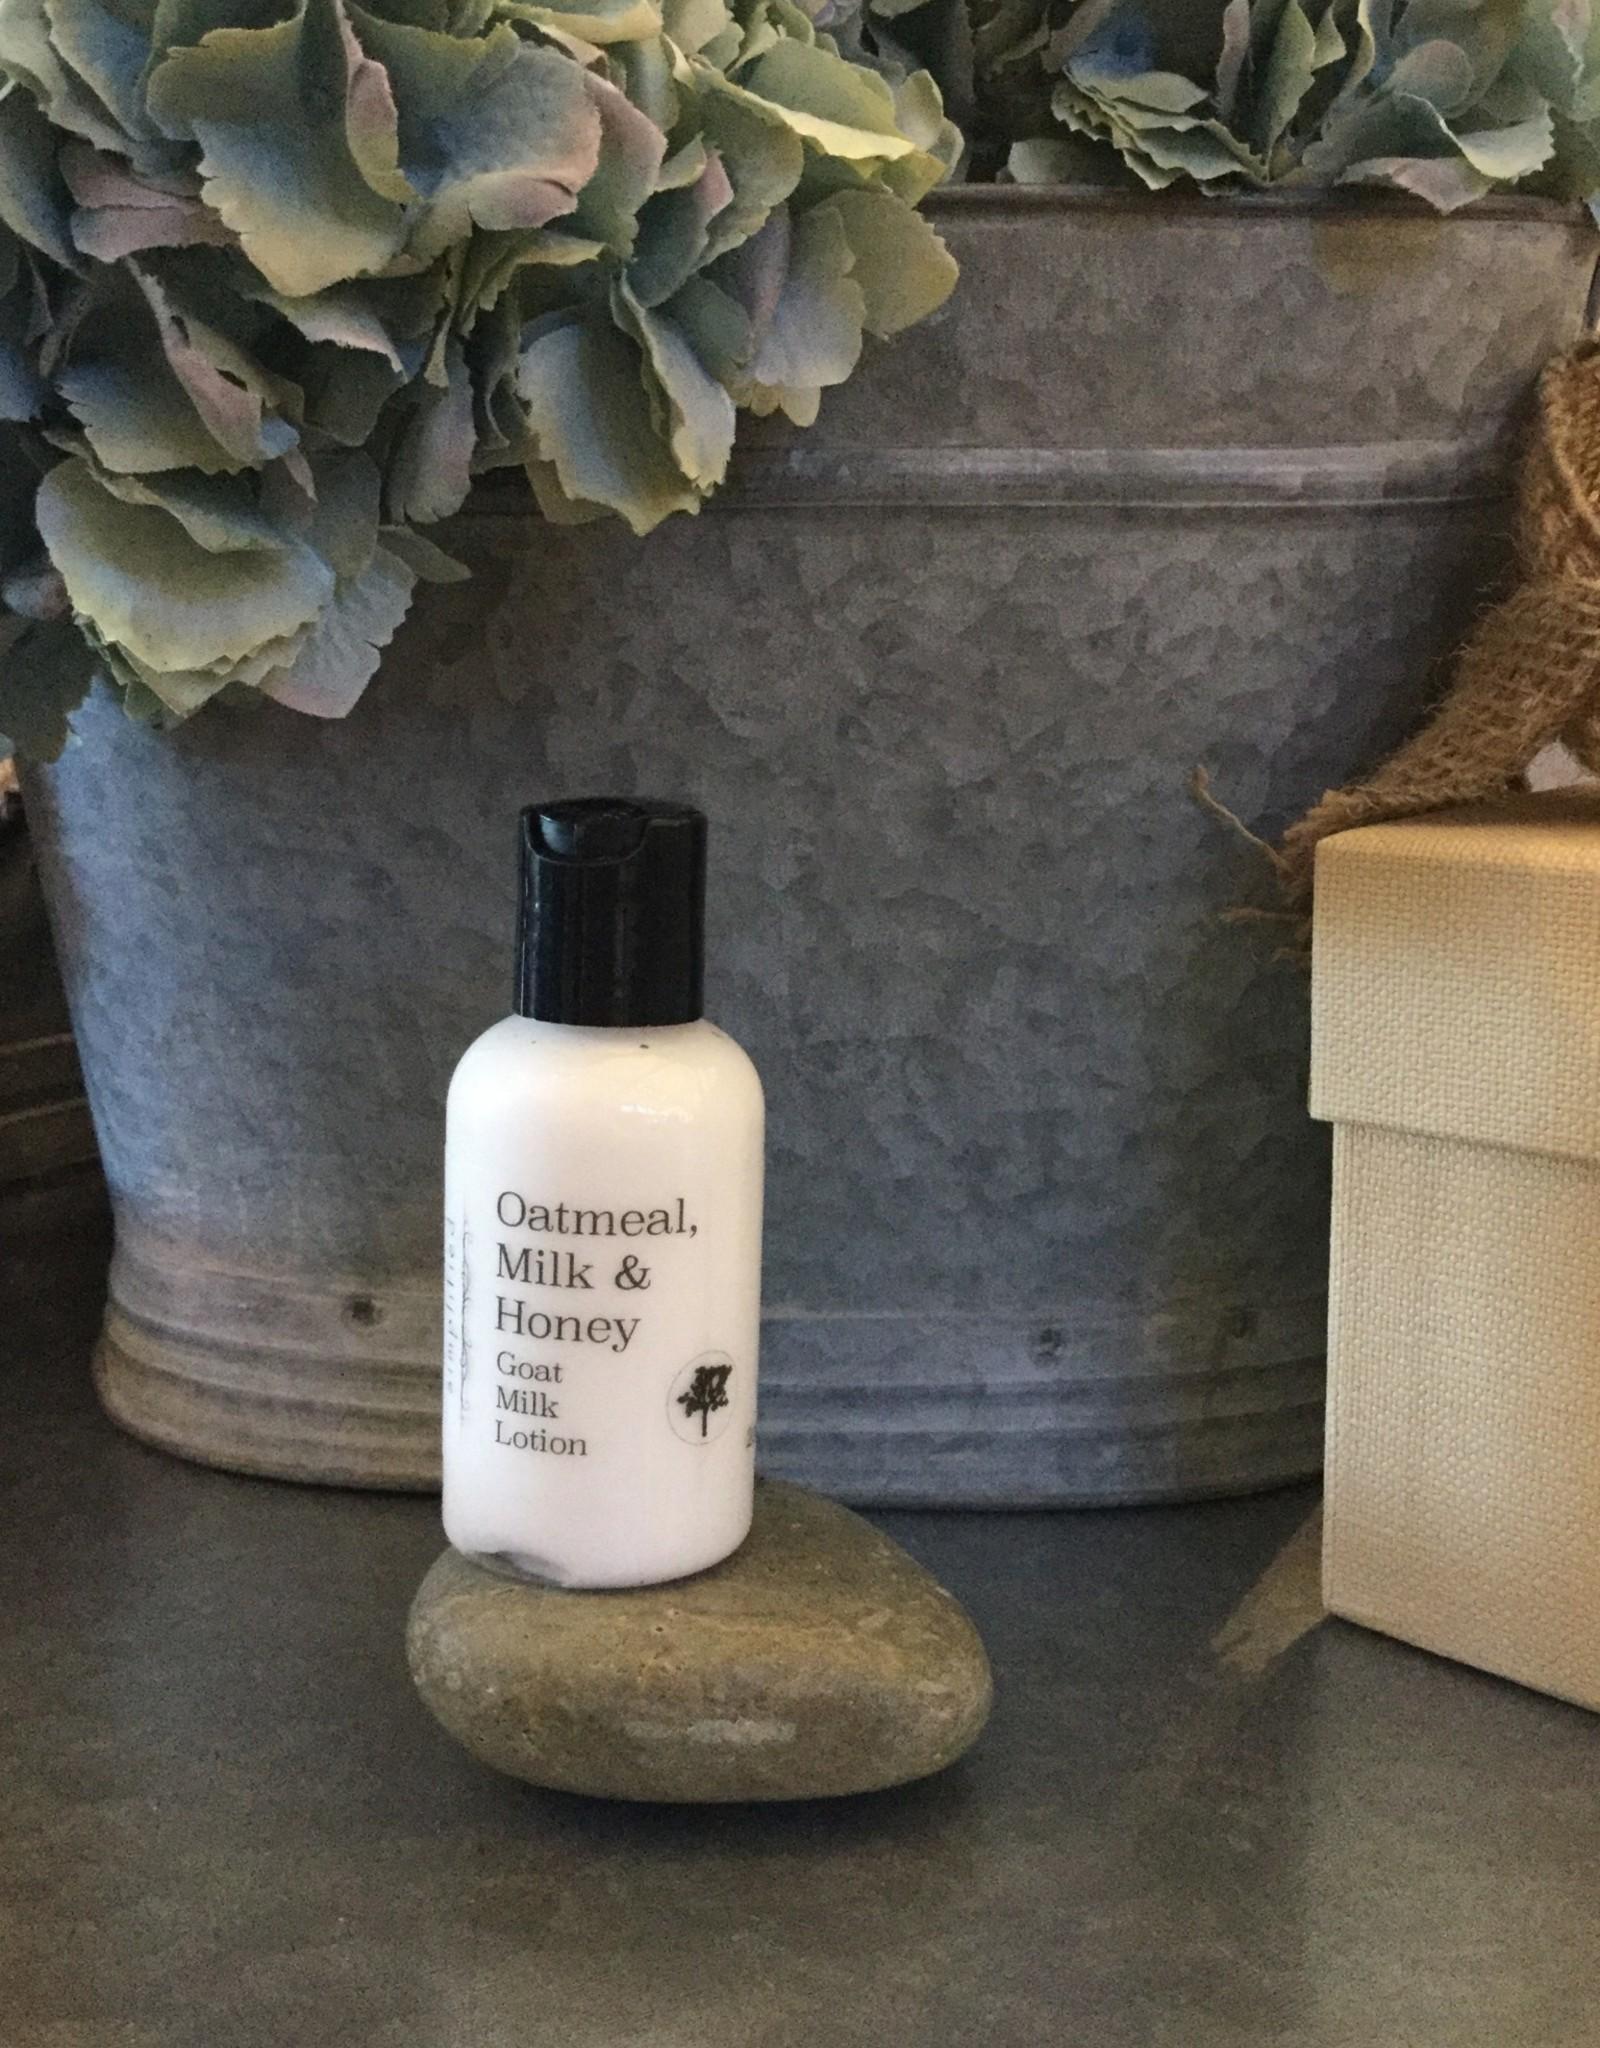 Simplified Soap Lotion 2oz - Oatmeal, Milk & Honey